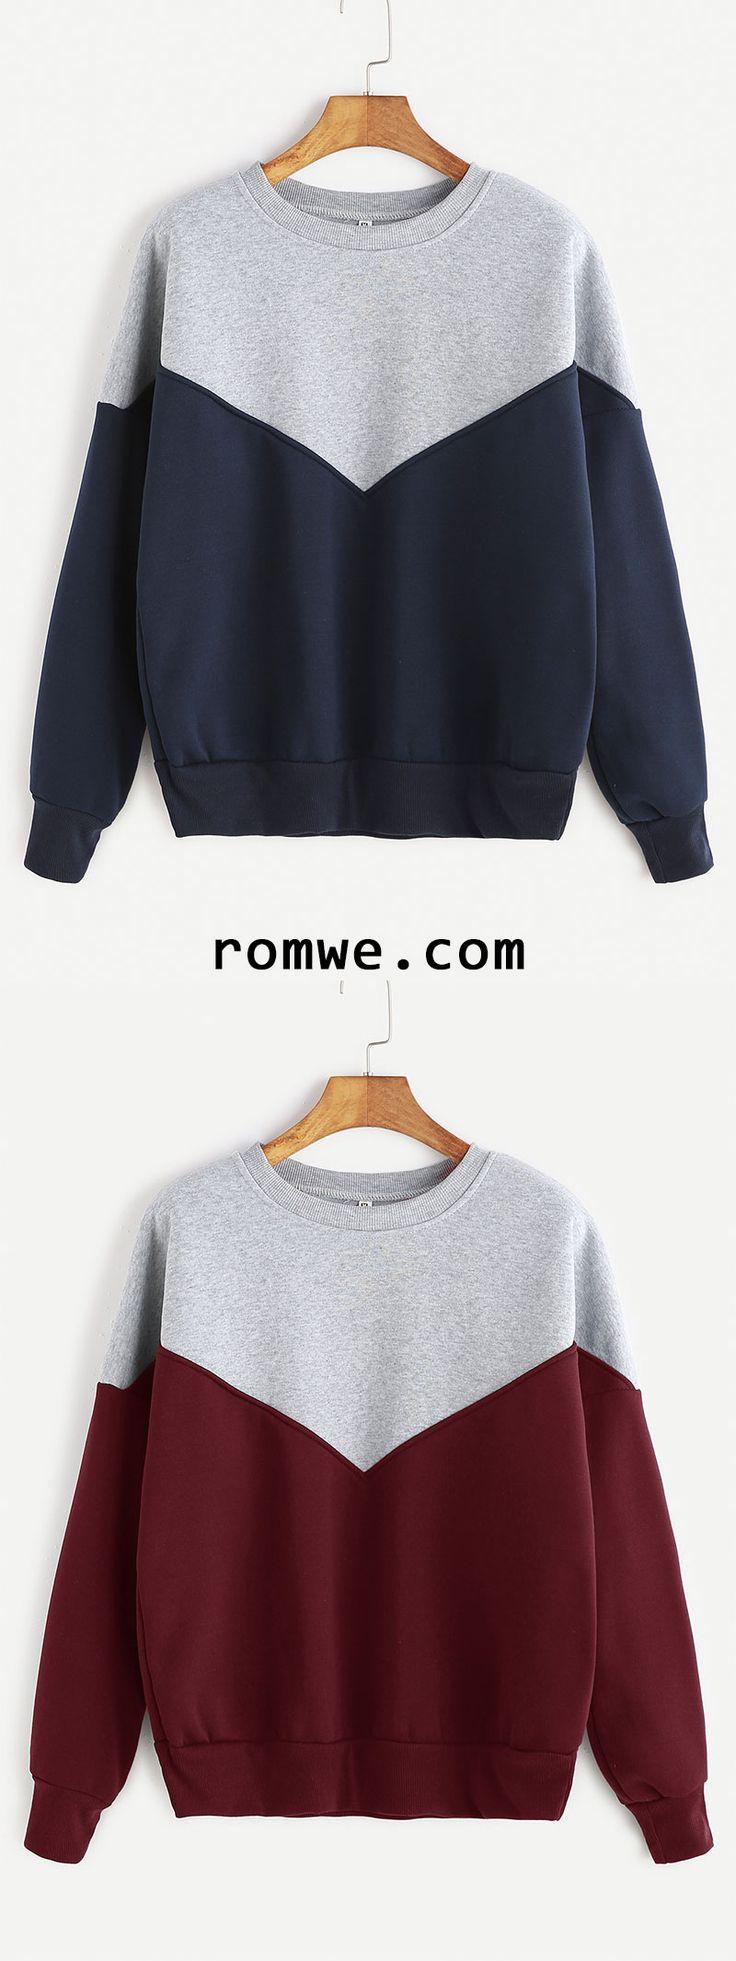 Contrast Dropped Shoulder Seam Sweatshirt